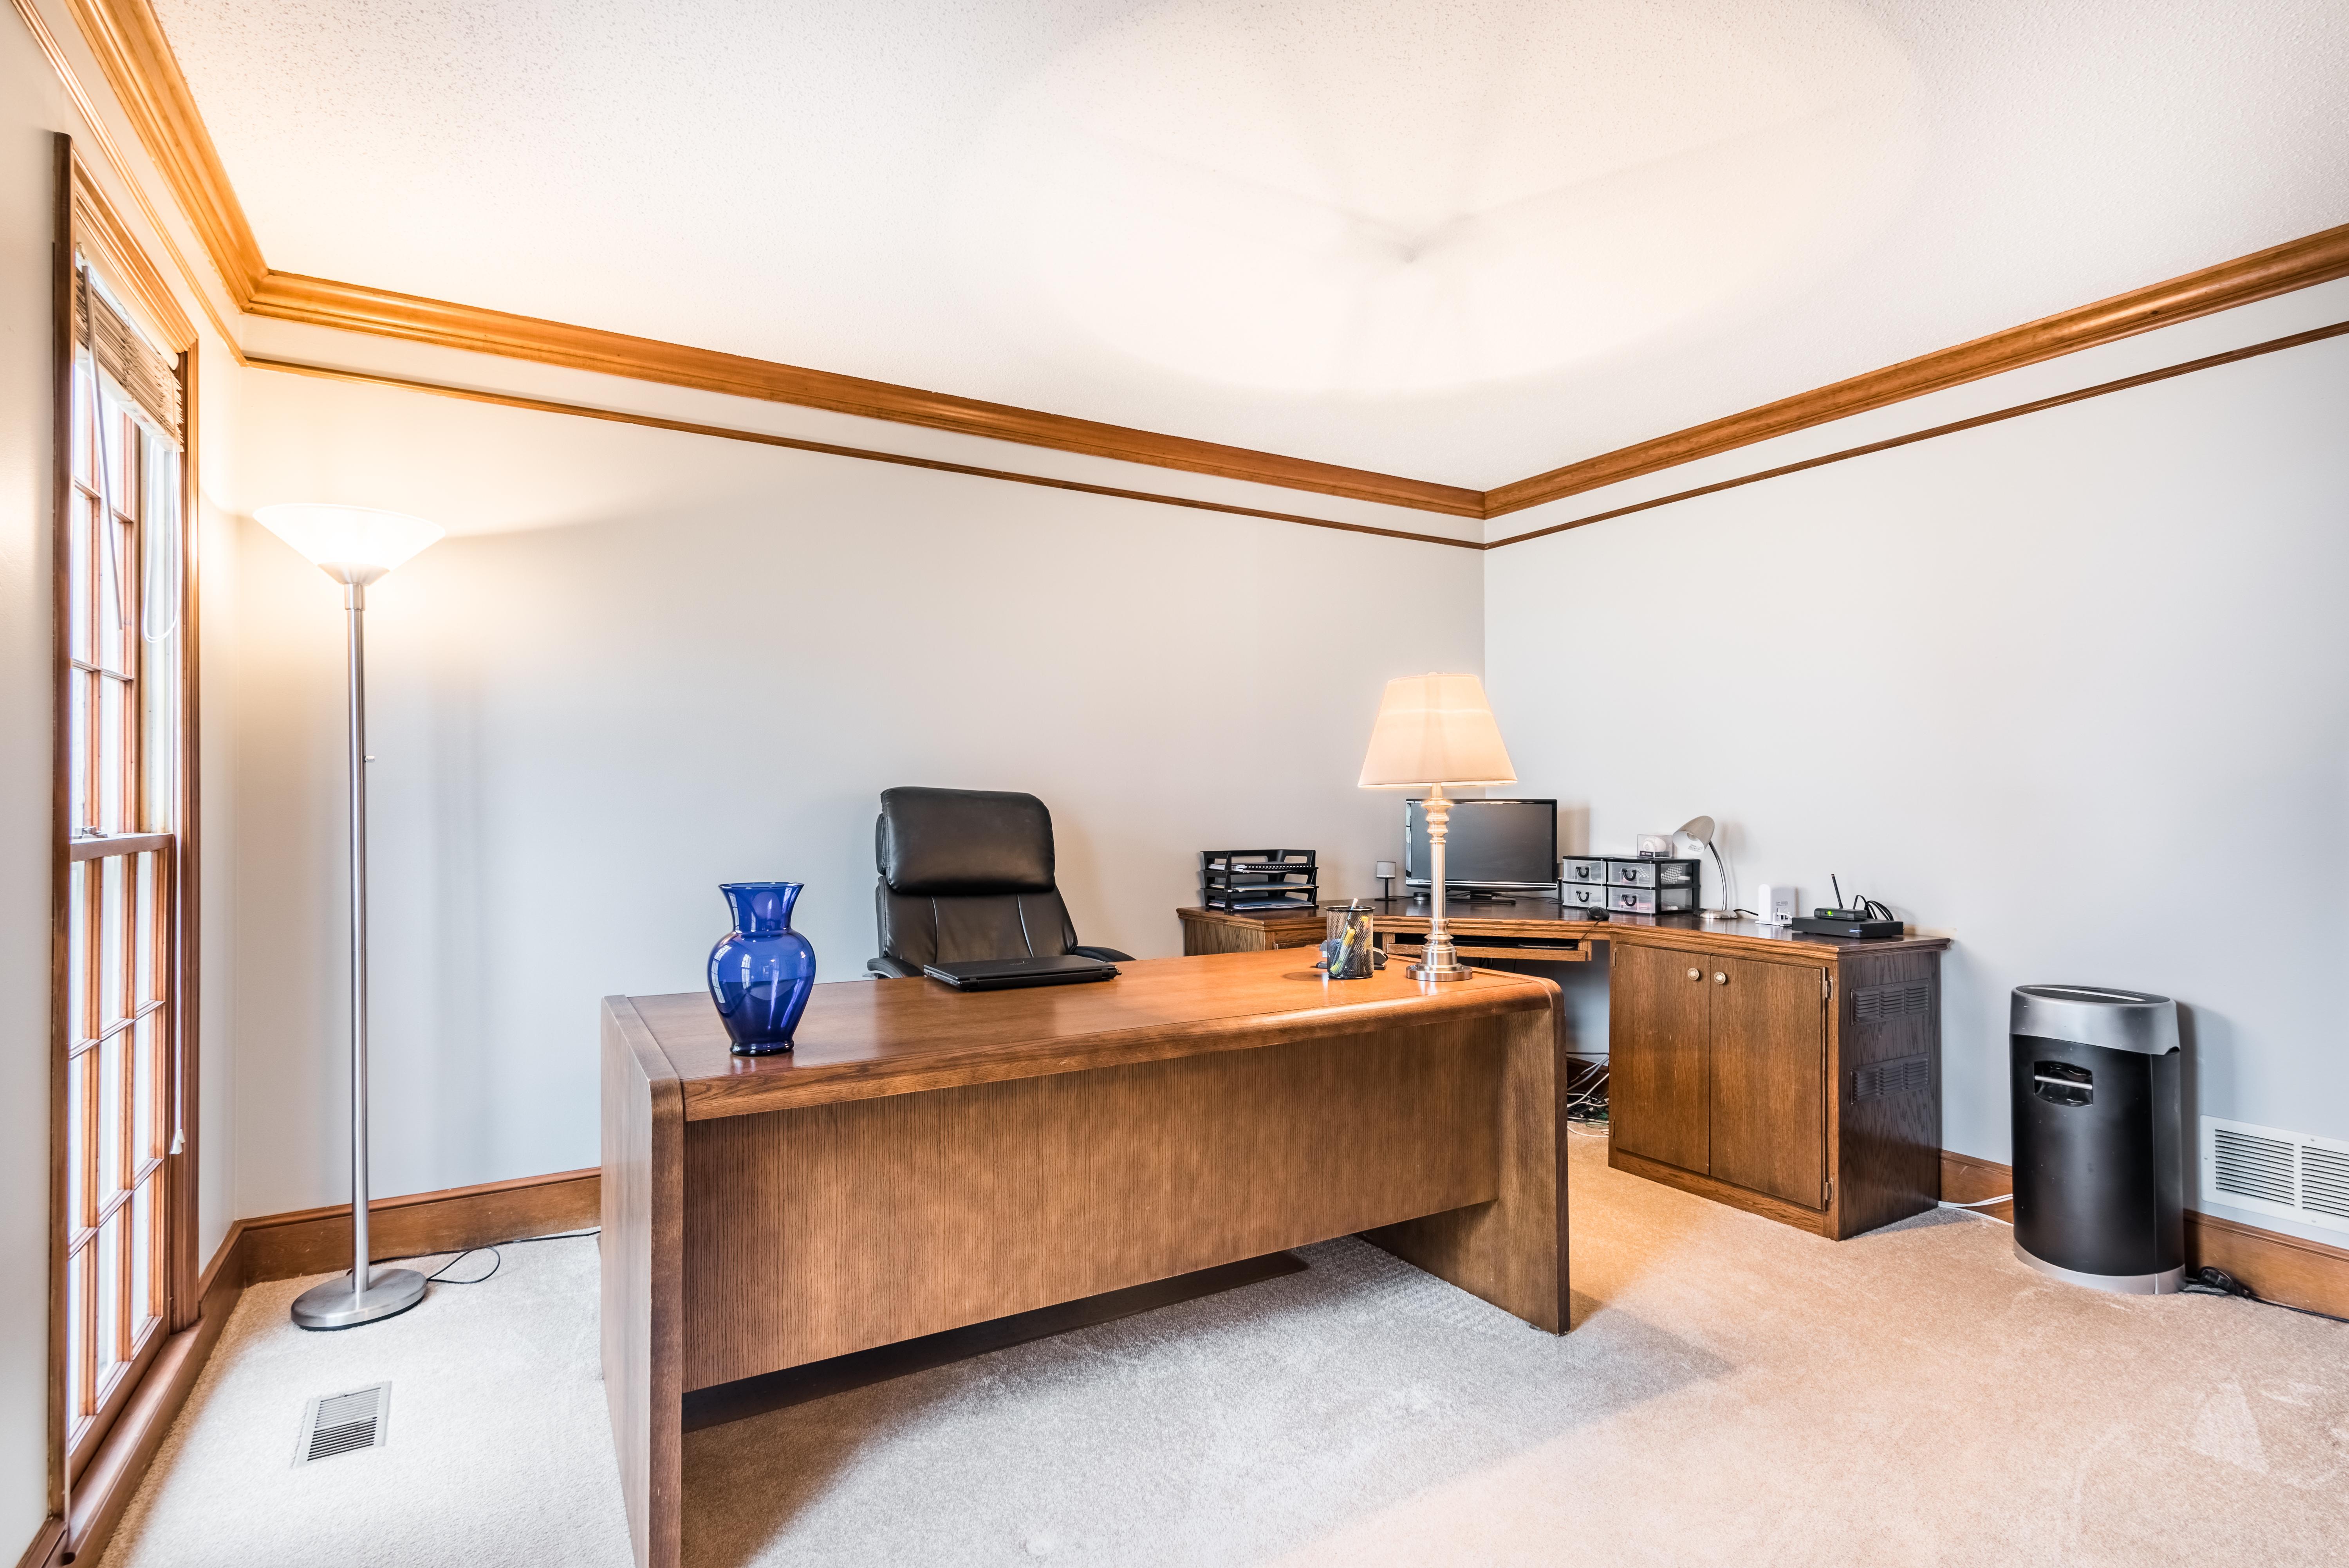 16000 W. Beckett Lane, Olathe - interior-1